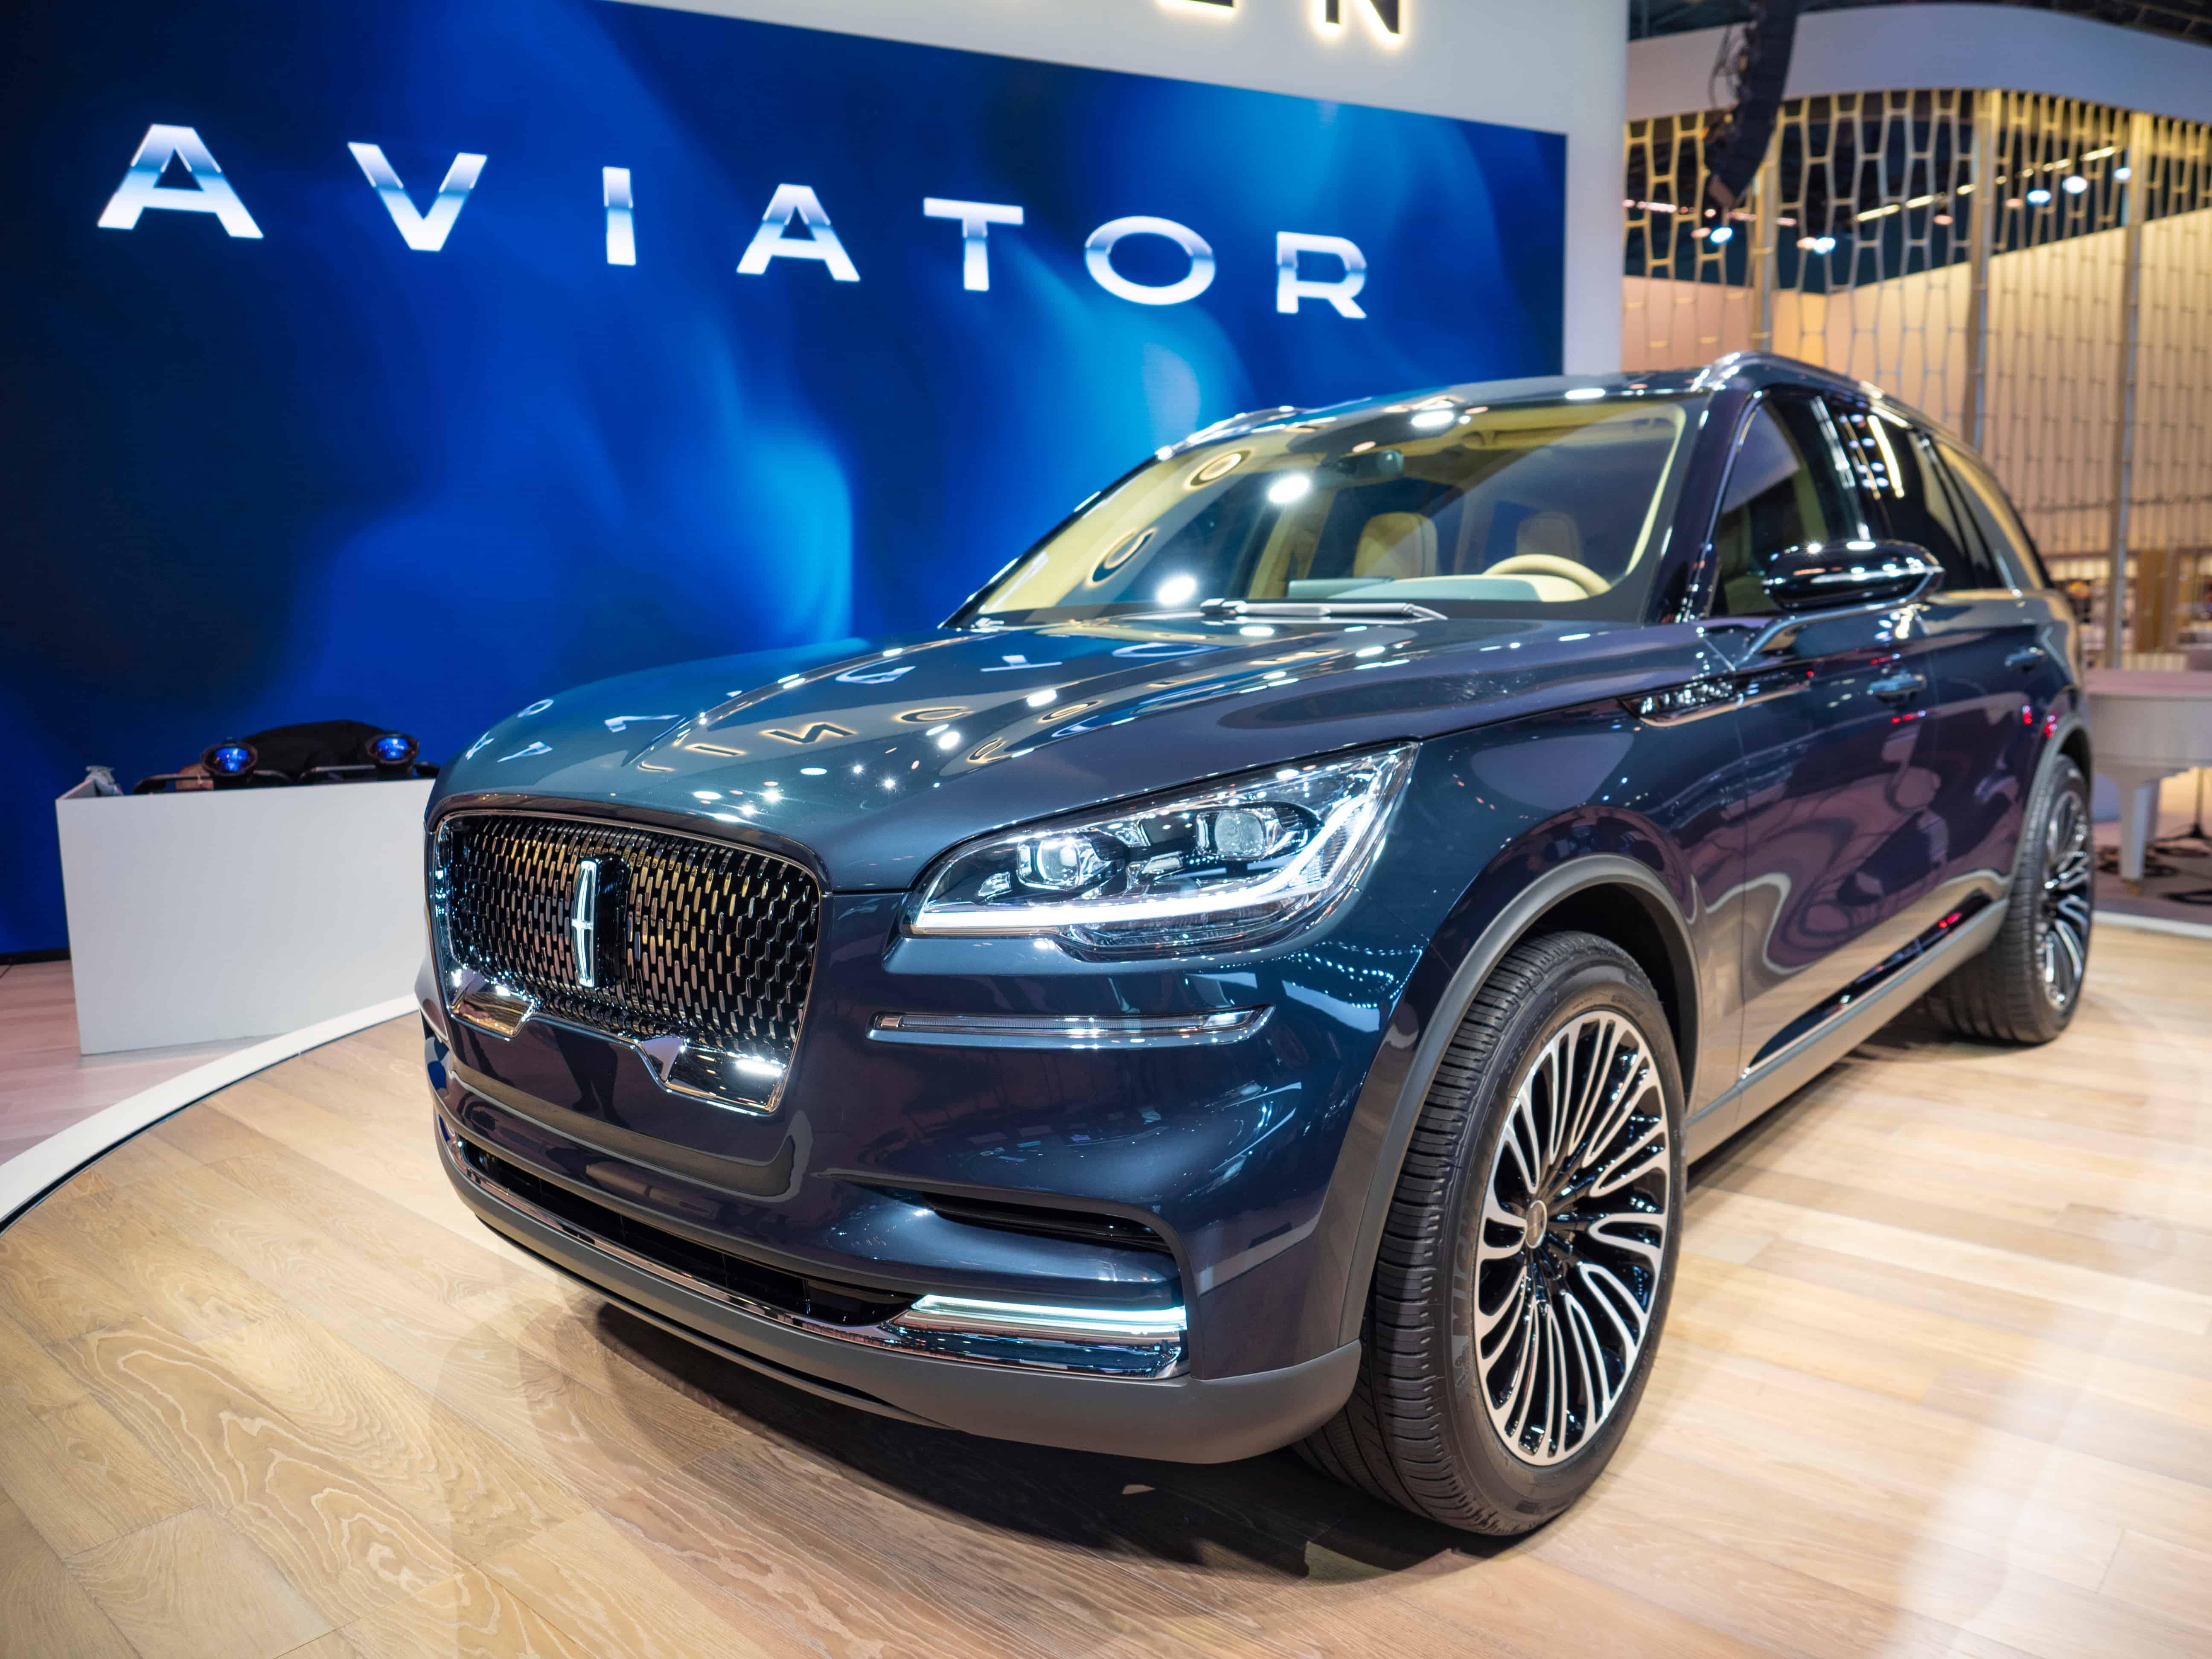 Ford Motor Company RecallsCertain 2020 Explorer and Lincoln Aviator Vehicles